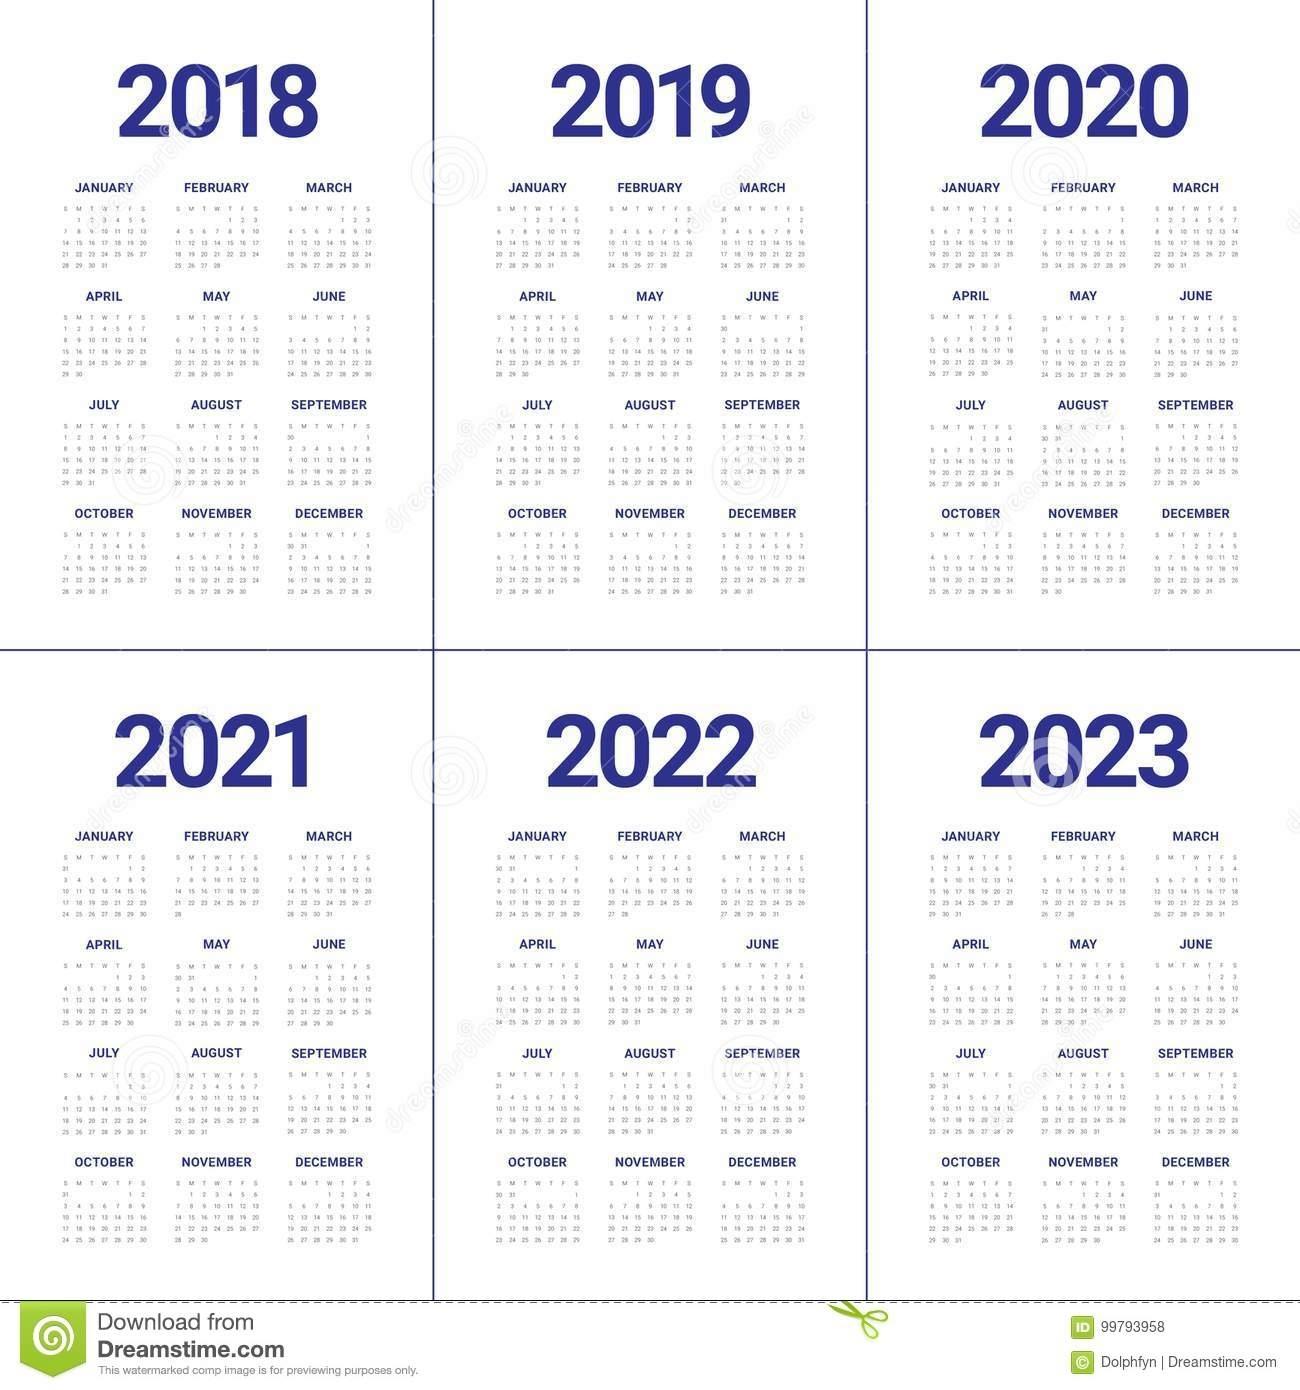 Three Year Printable Calendar 2021 To 2023 | Calendar regarding Jfrd 2022 Shift Calendar